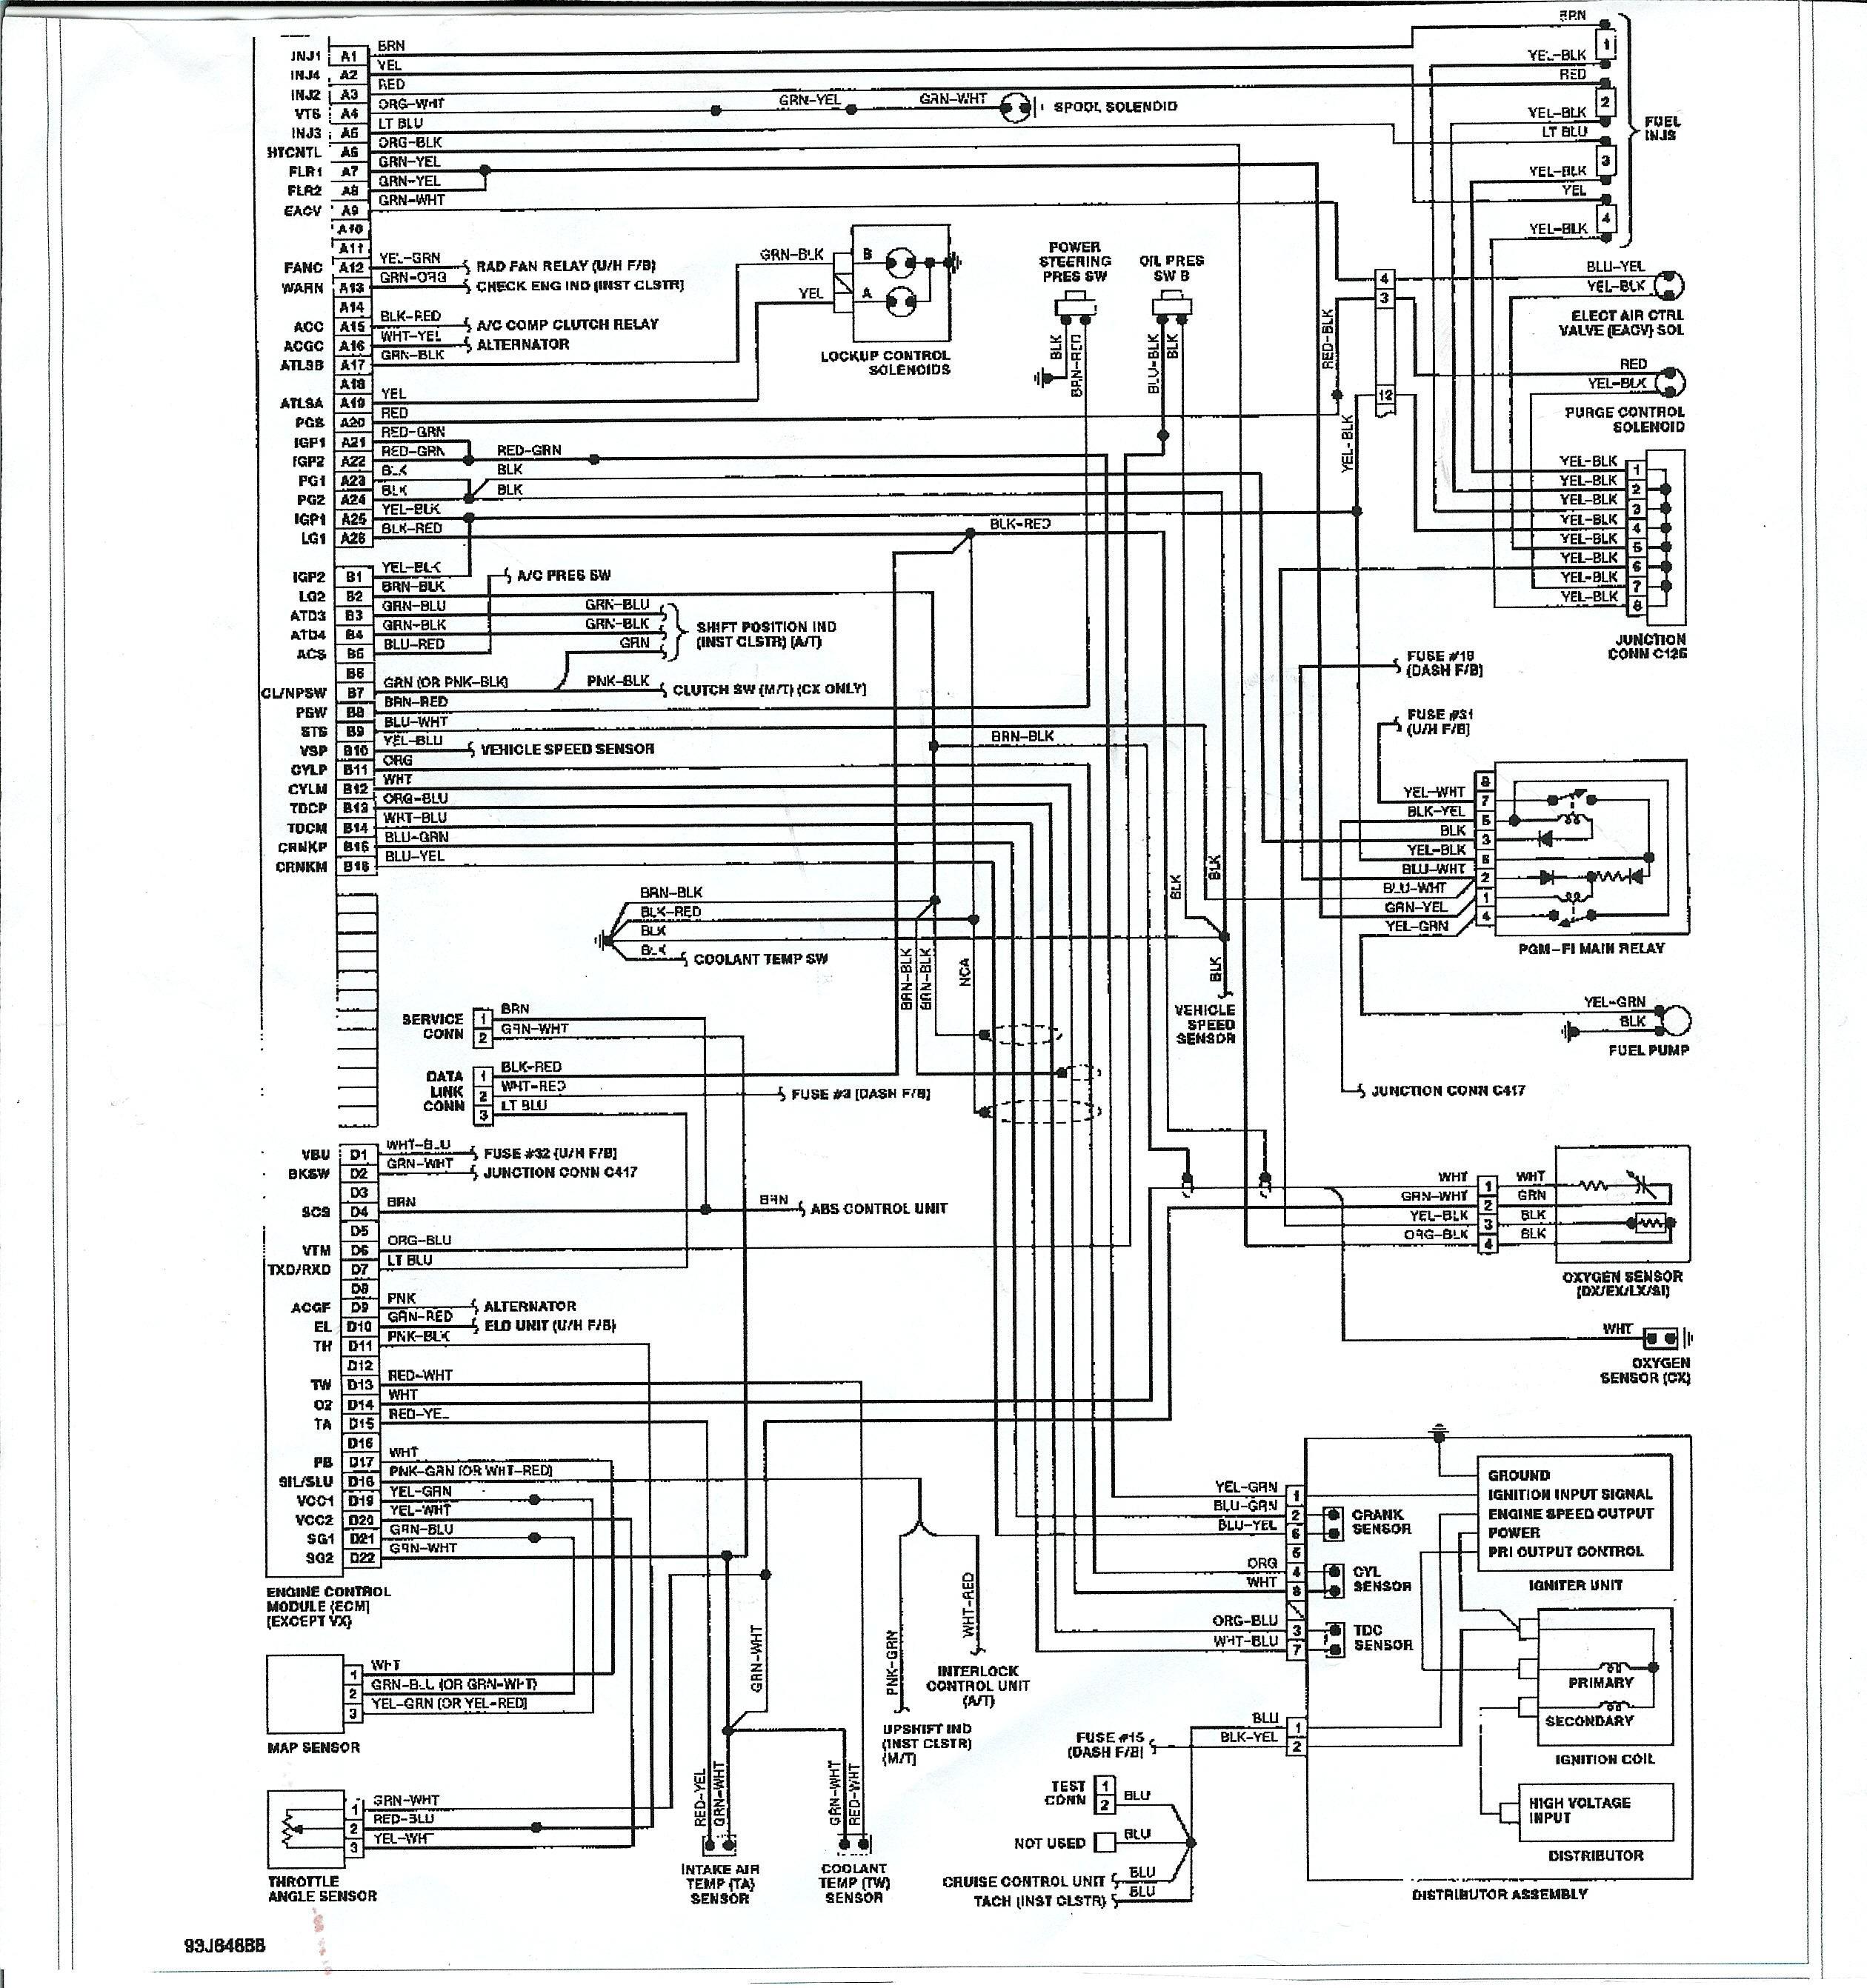 2000 Honda Civic Engine Diagram 2000 Honda Accord Engine Diagram Vw  Transporter Wiring Diagram 95 Of